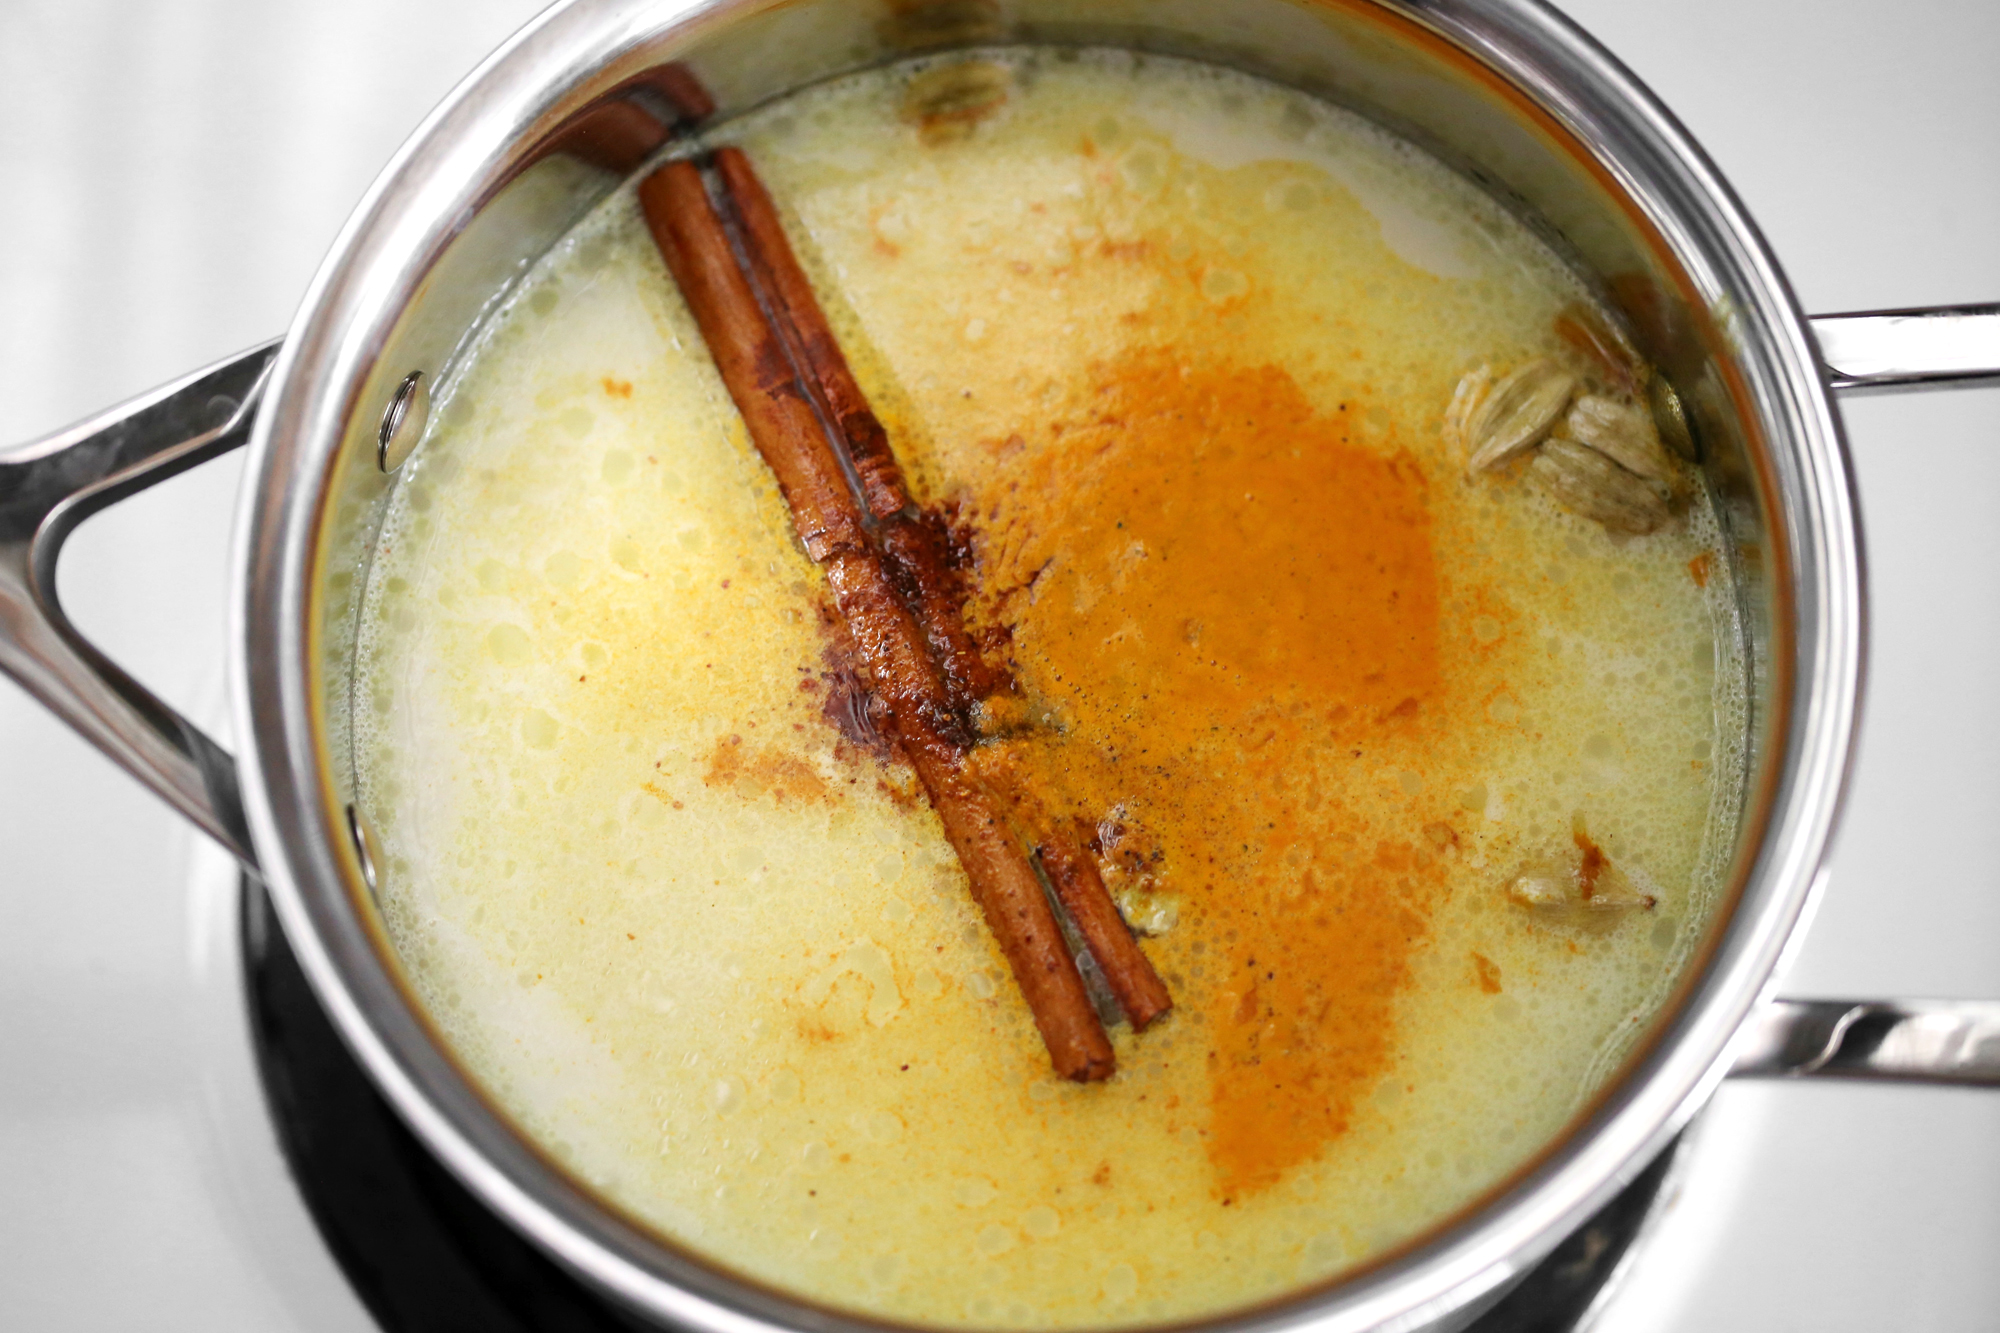 Ginger Turmeric and Cardamom Latte Tea with Manuka Honey- Vegan - All Natural Recipe - woahstyle.com - Nathalie Martin_6578.jpg